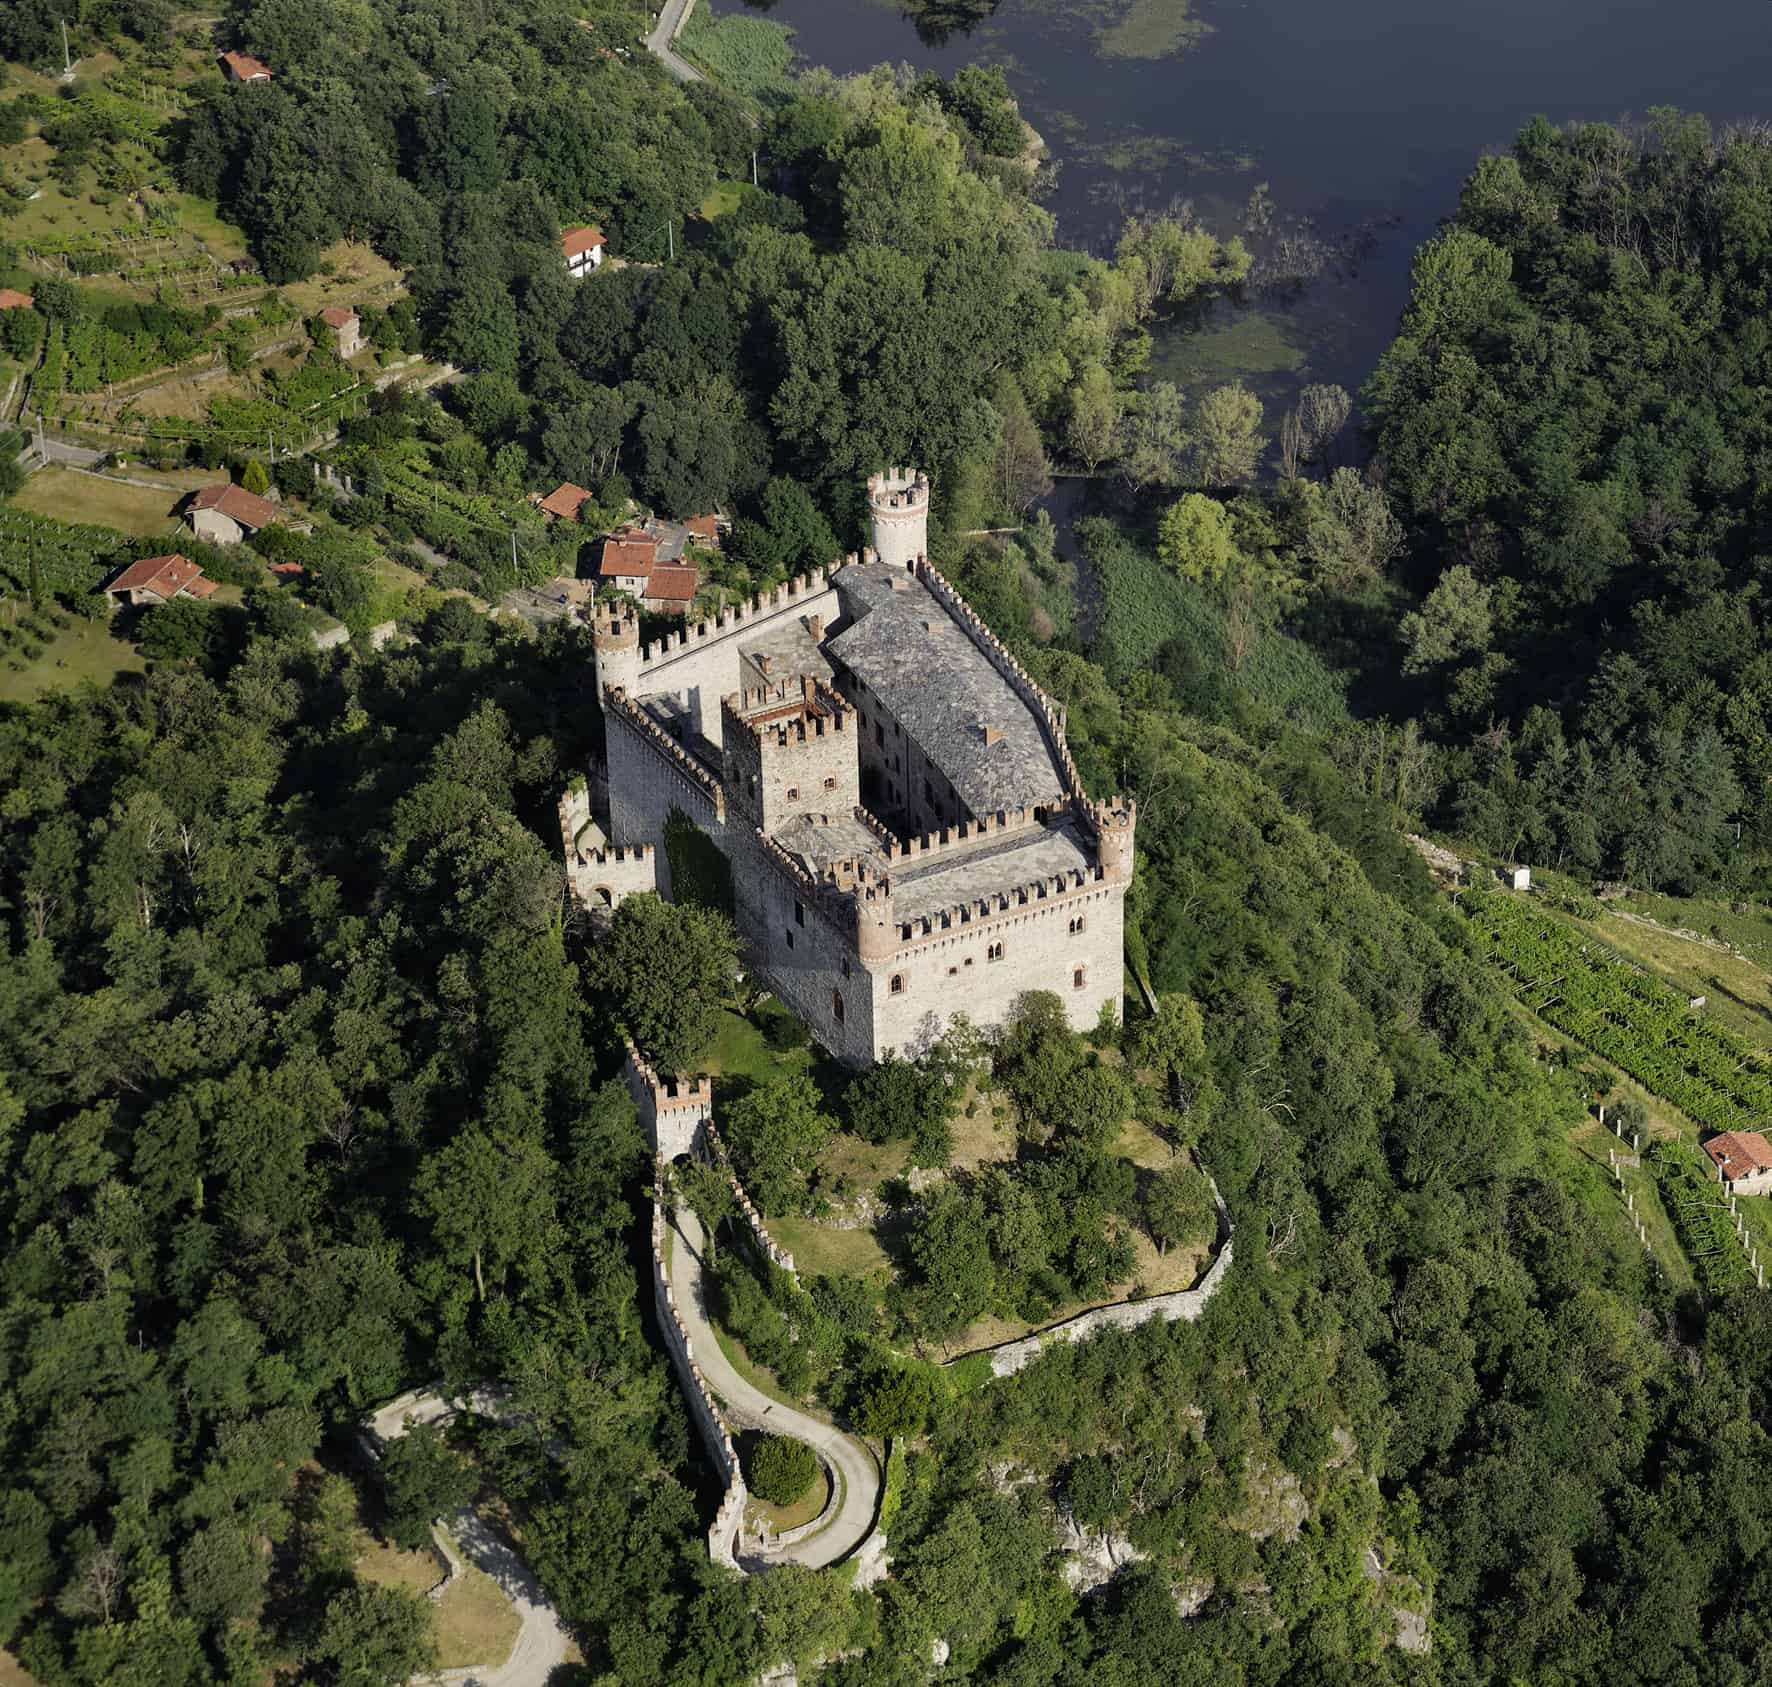 Montalto Dora castle